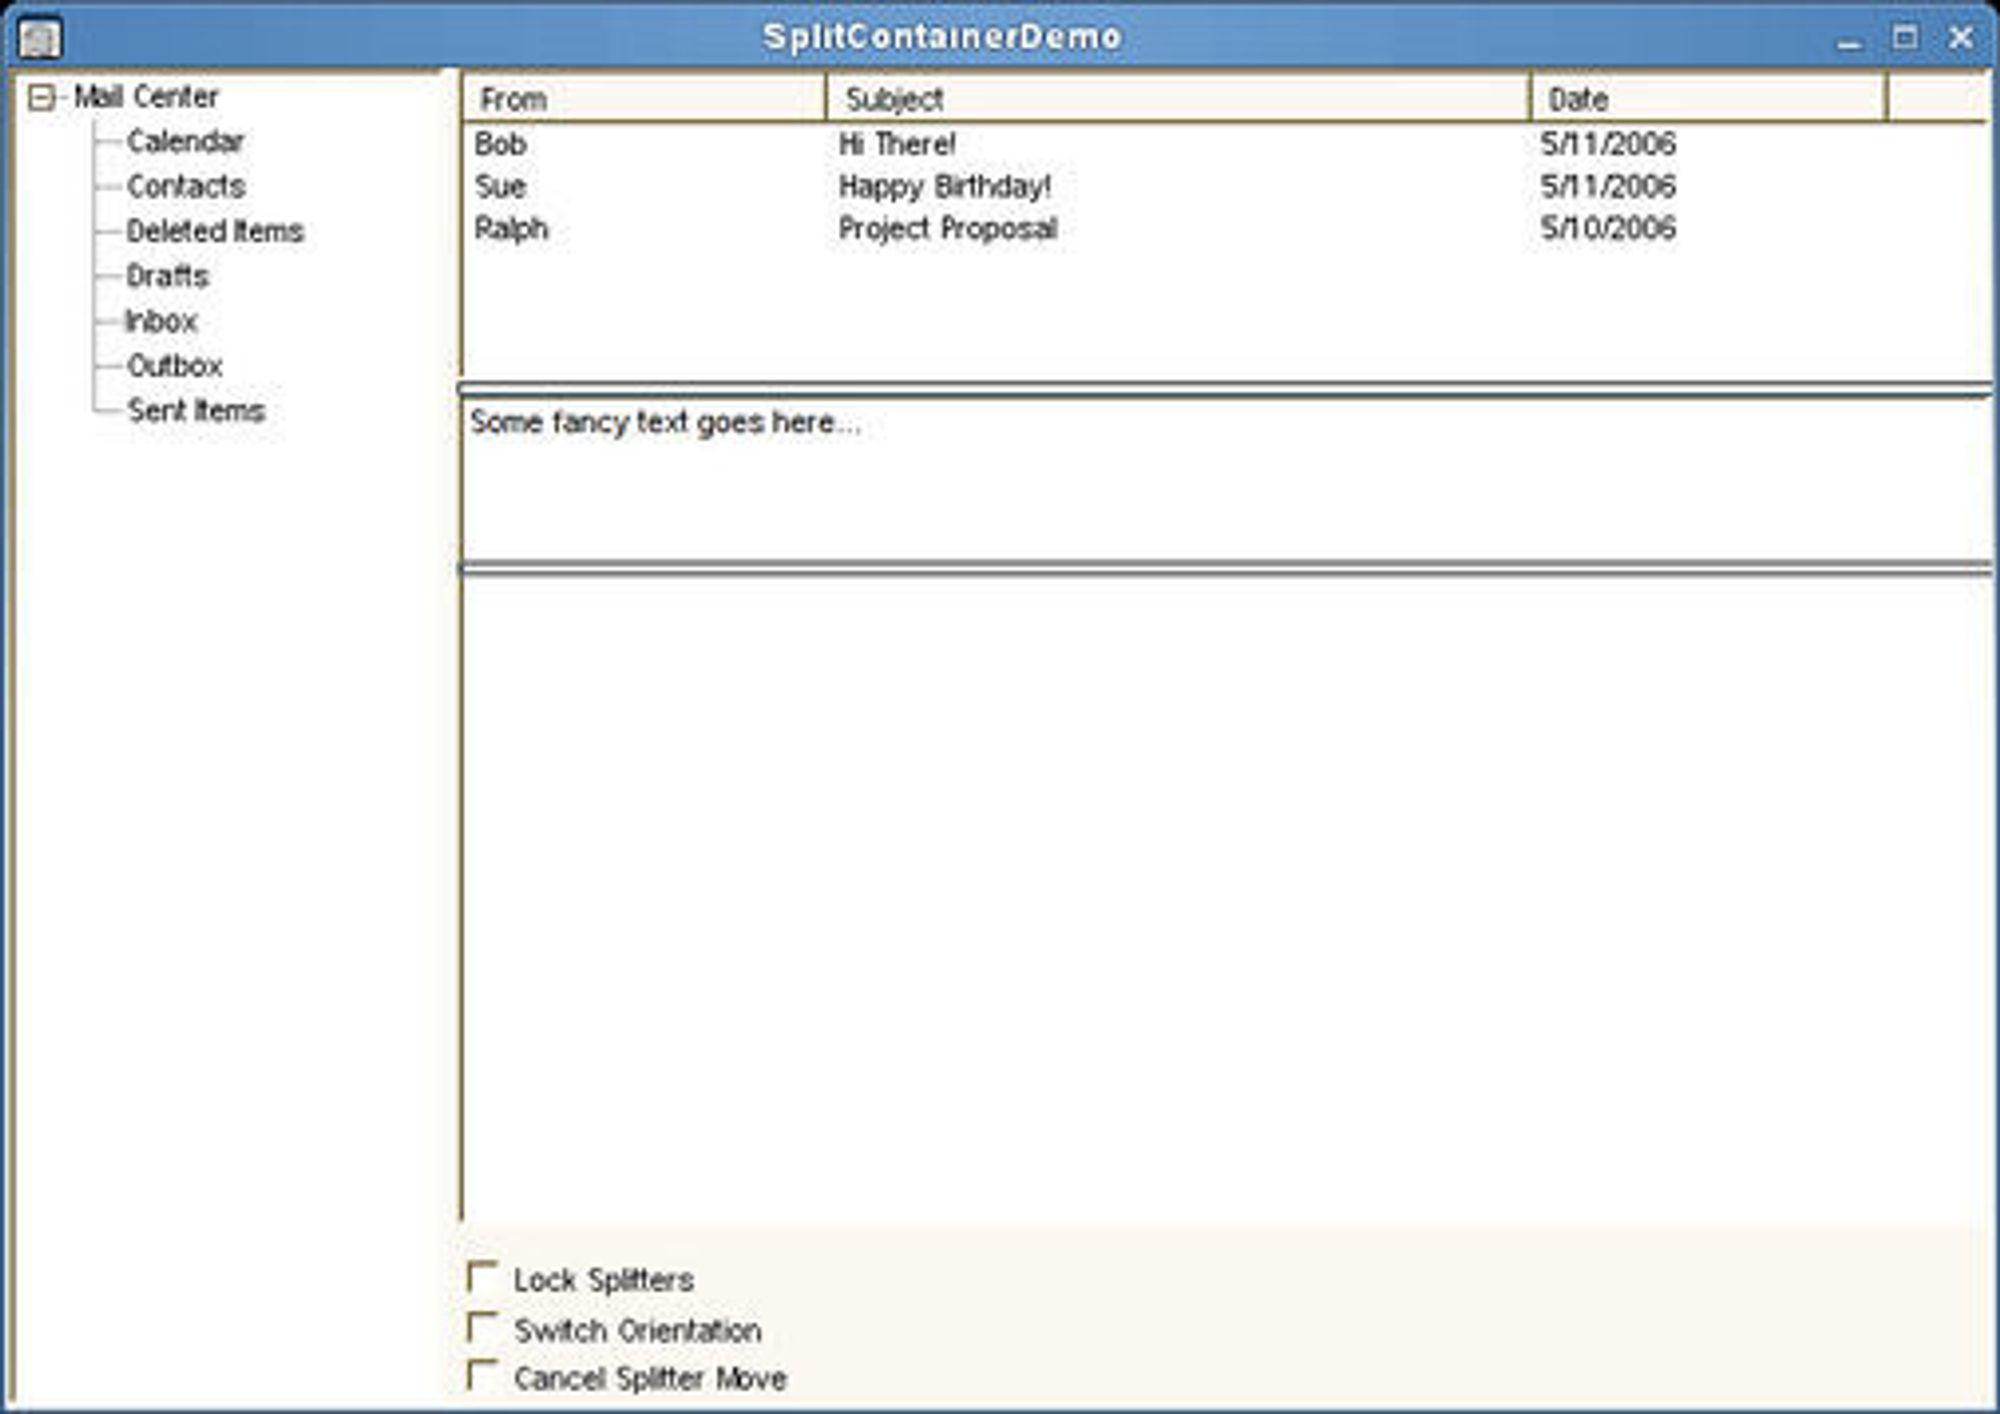 Mono 2.0 støtter kontrollen Splitcontainer.